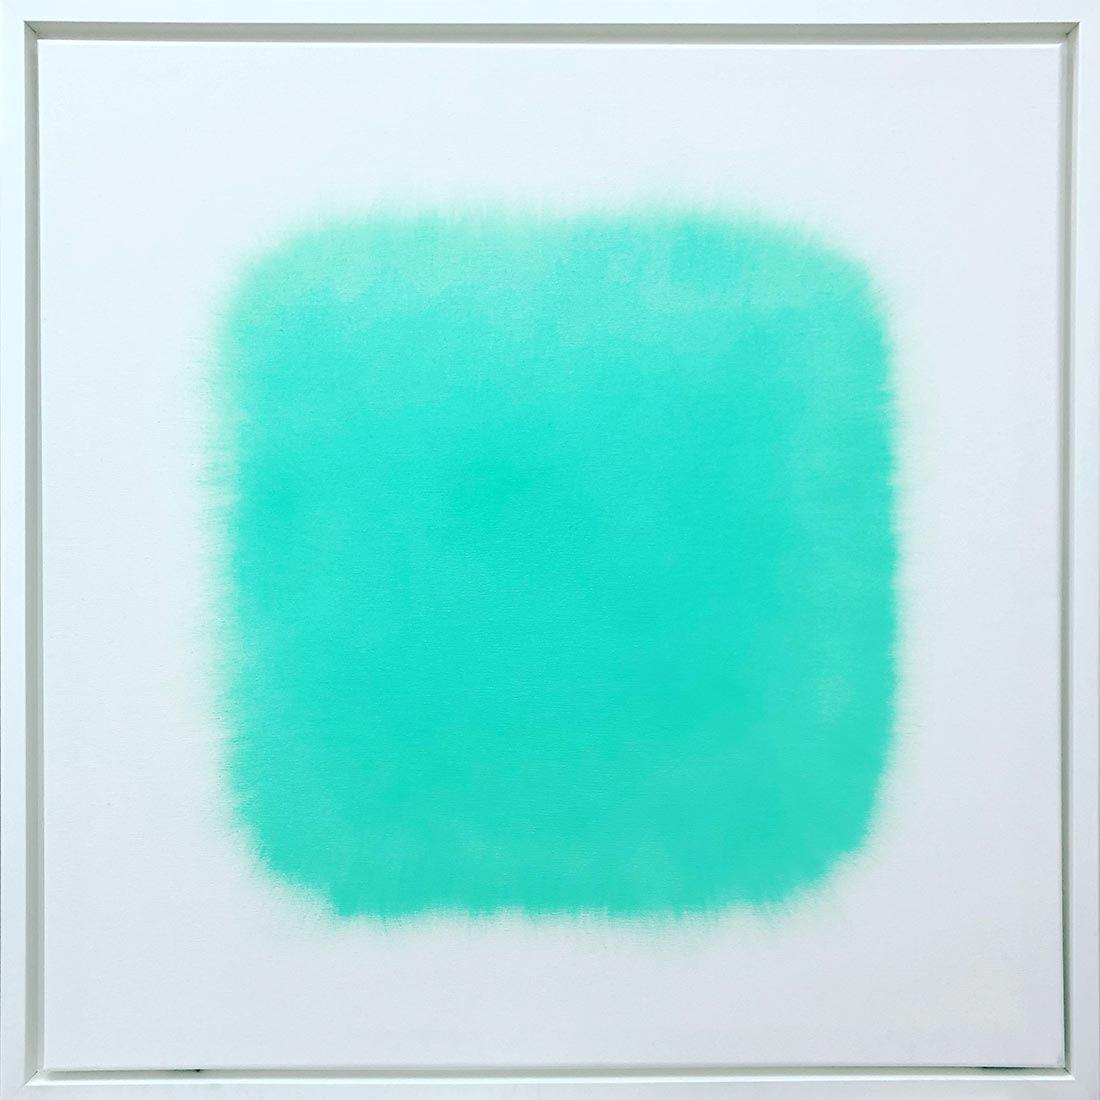 turqouise light | 2020 | oil on canvas | 80 x 80 cm (framed: 84 x 84 cm)